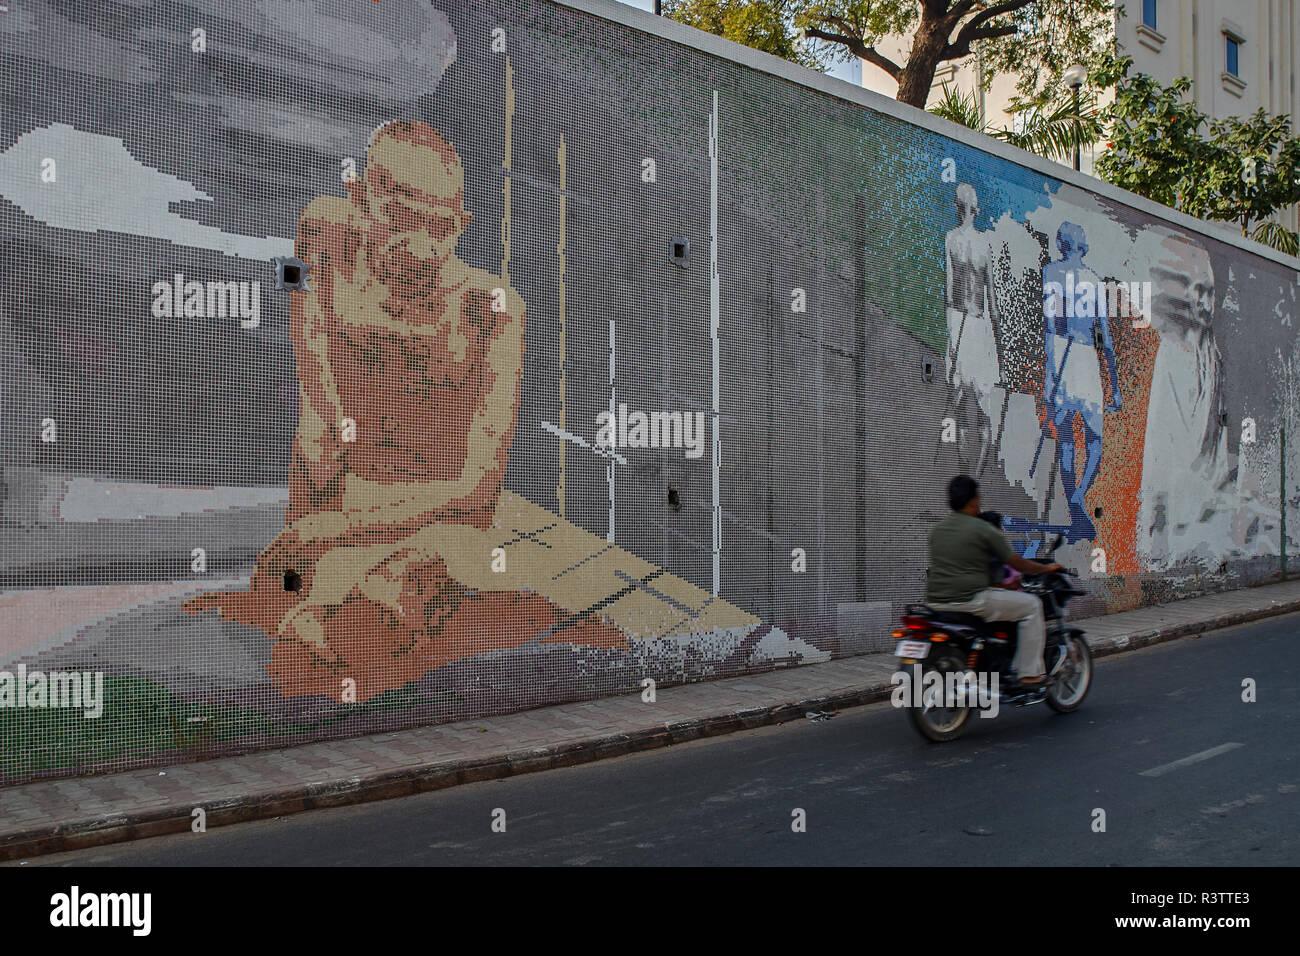 16-Dec-2007-mosaic venetian tiles Painting of Mahatma Gandhi ; Ahmedabad ; Gujarat ; India asia - Stock Image